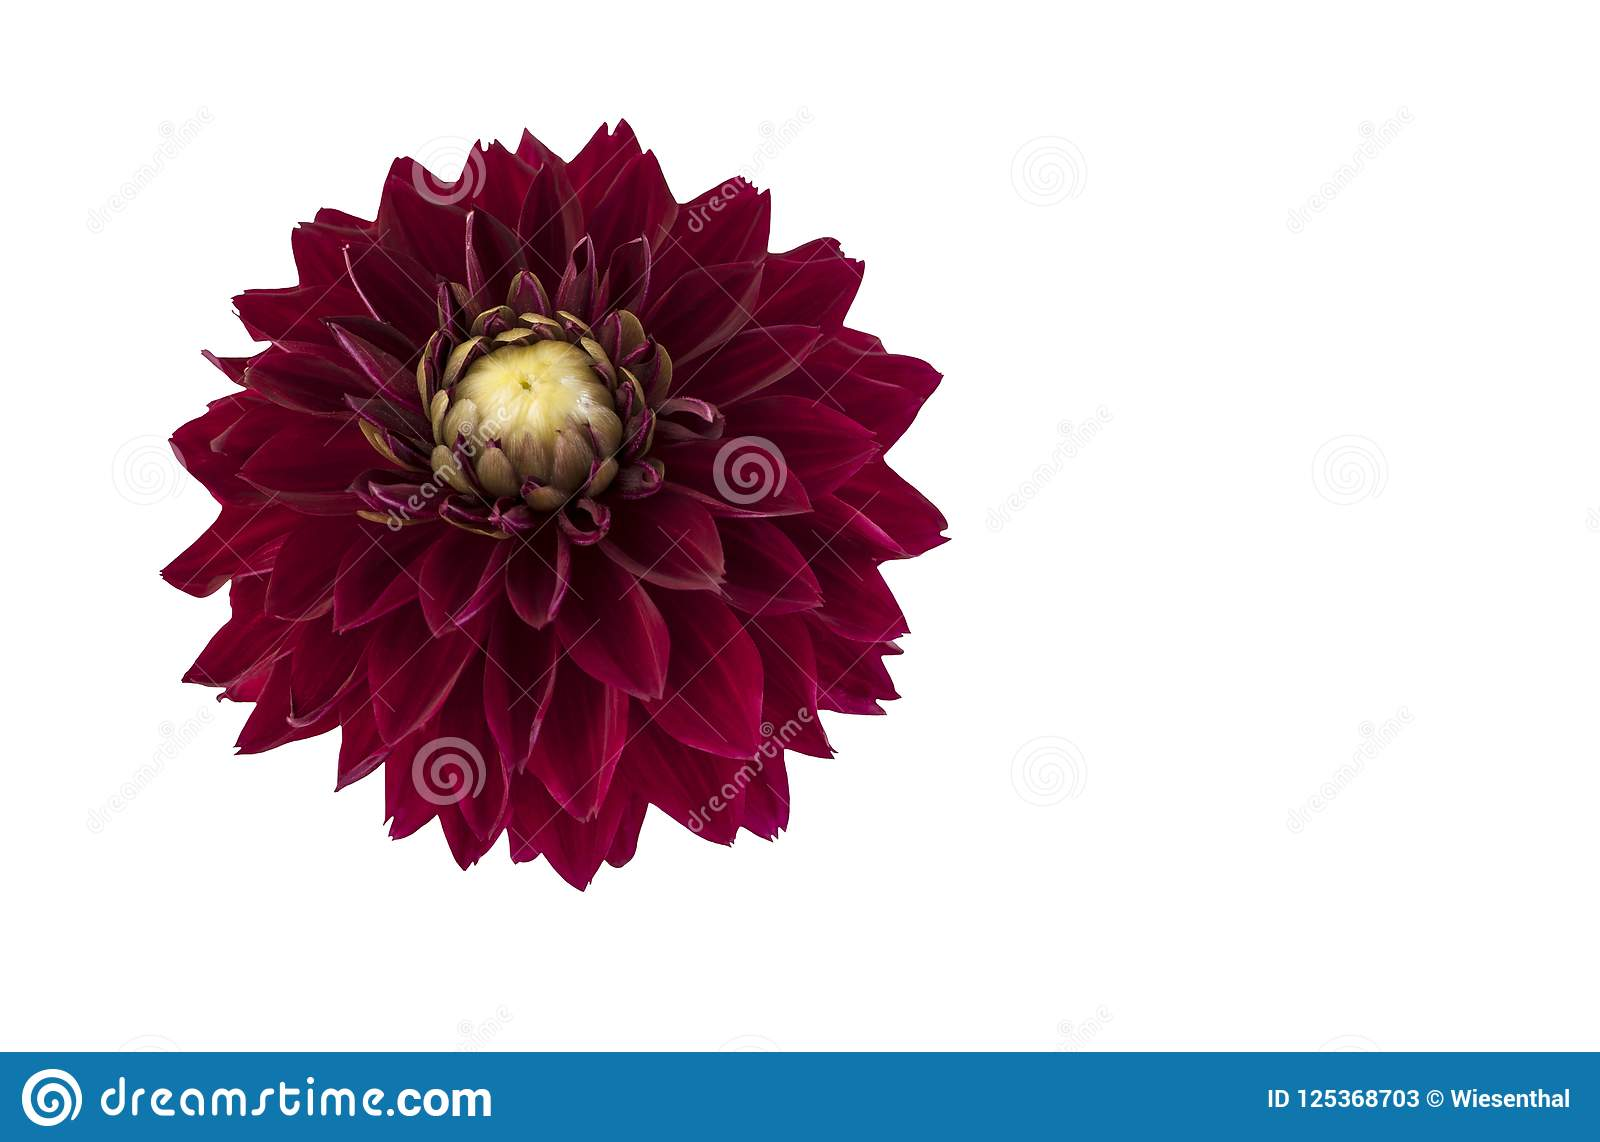 Dark Red Dahlia Flower Stock Image Image Of Blooming 125368703